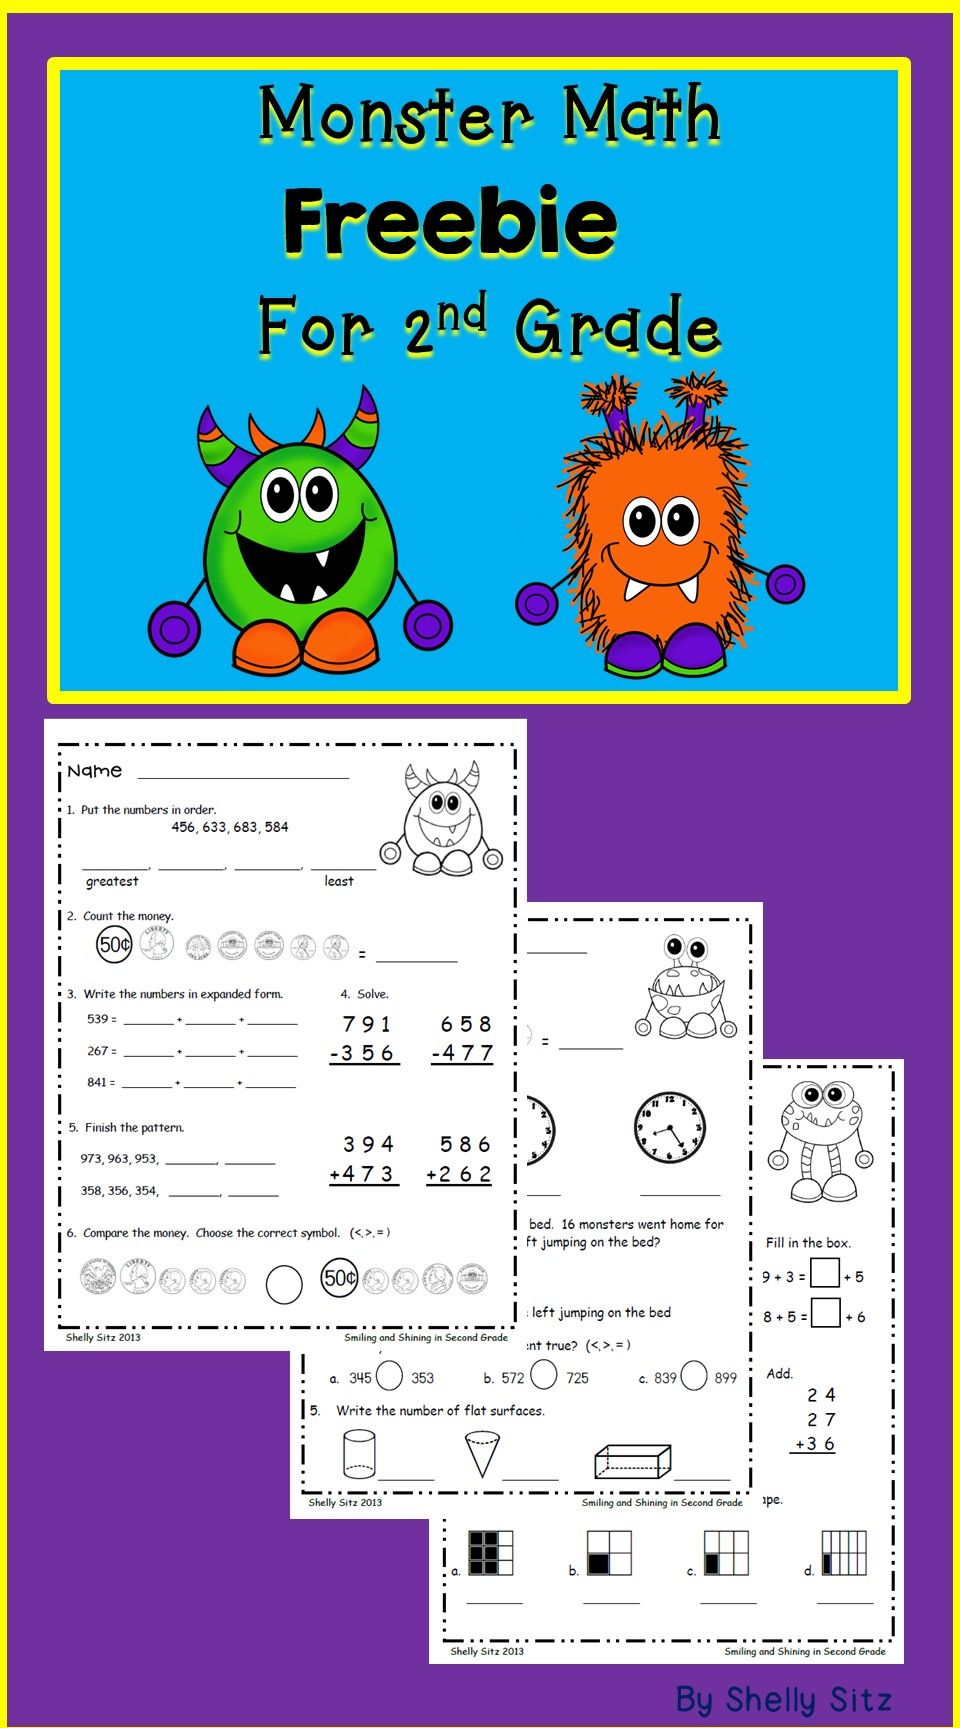 Printed Monster Math Freebie